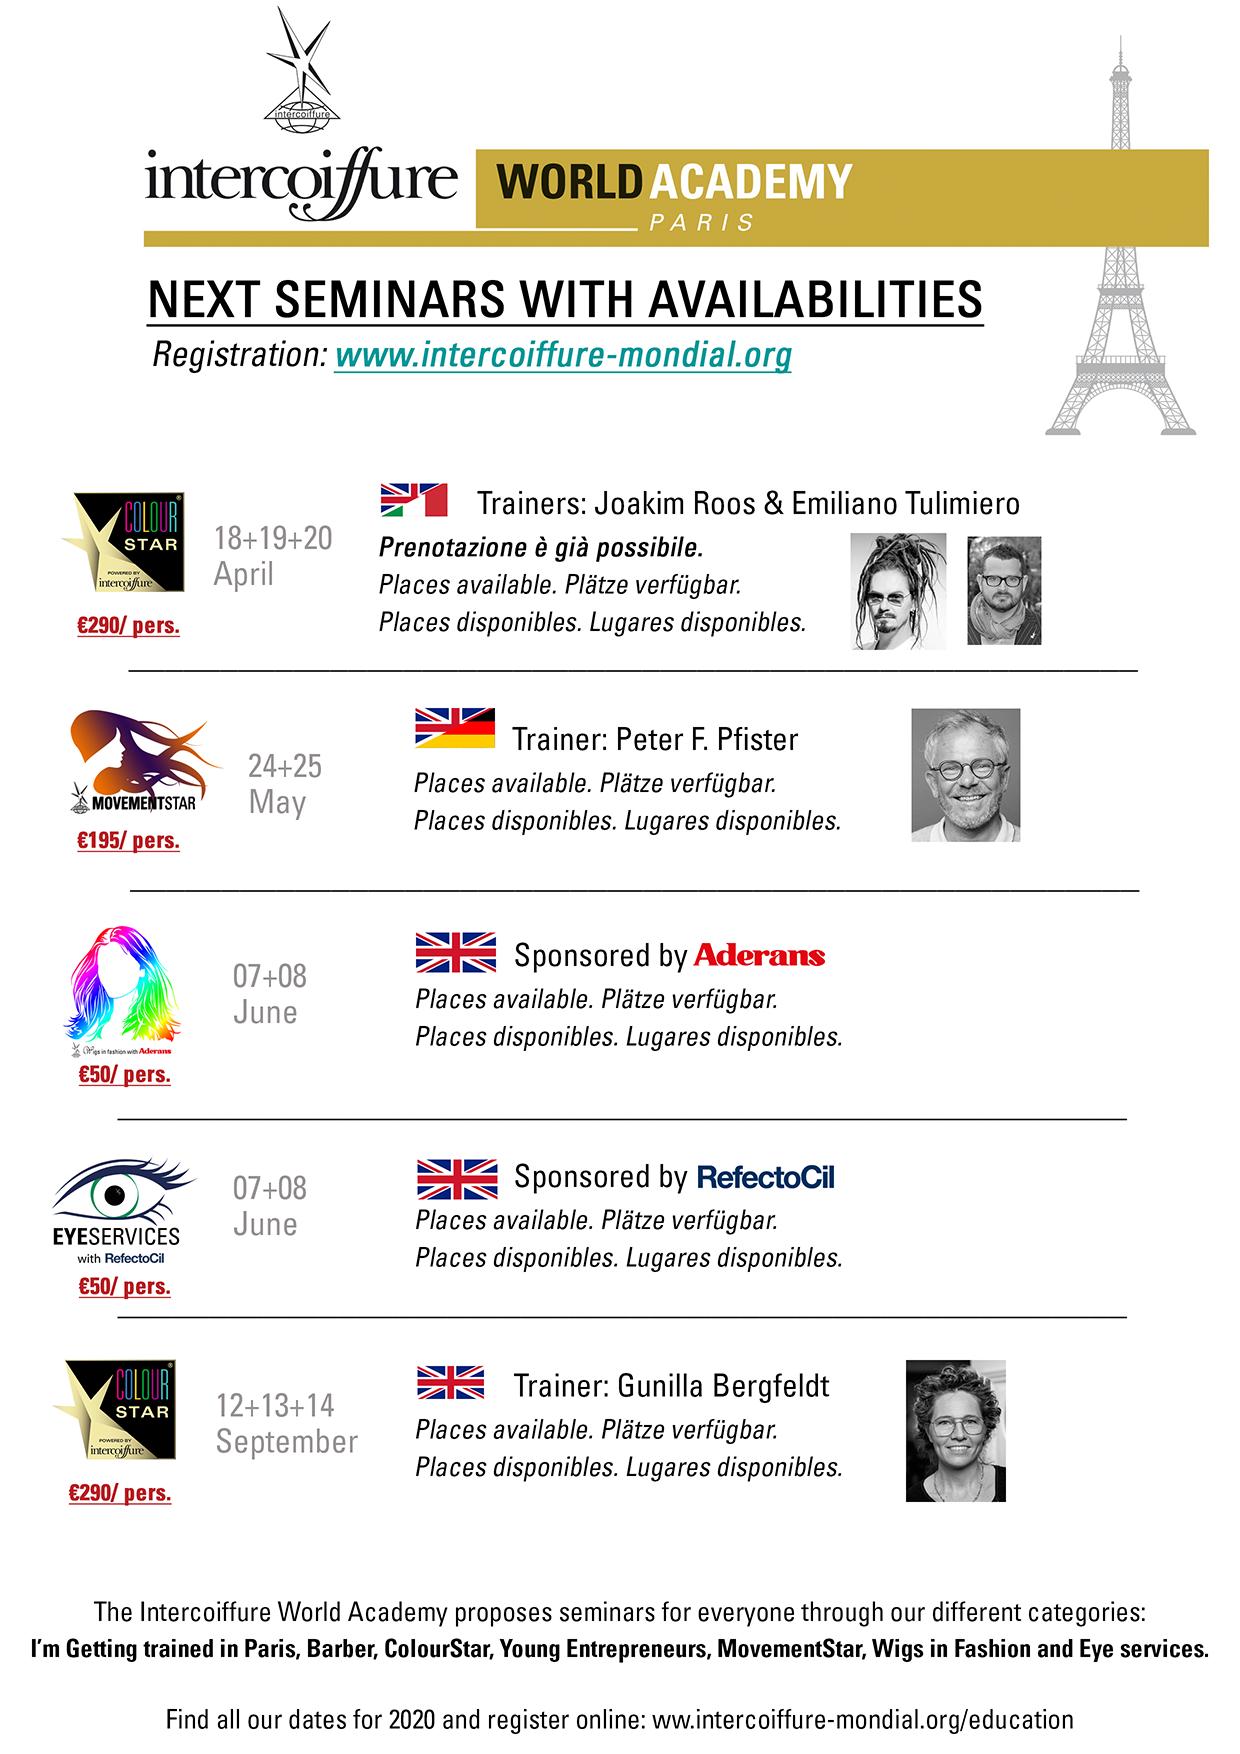 Next seminar dates 2020